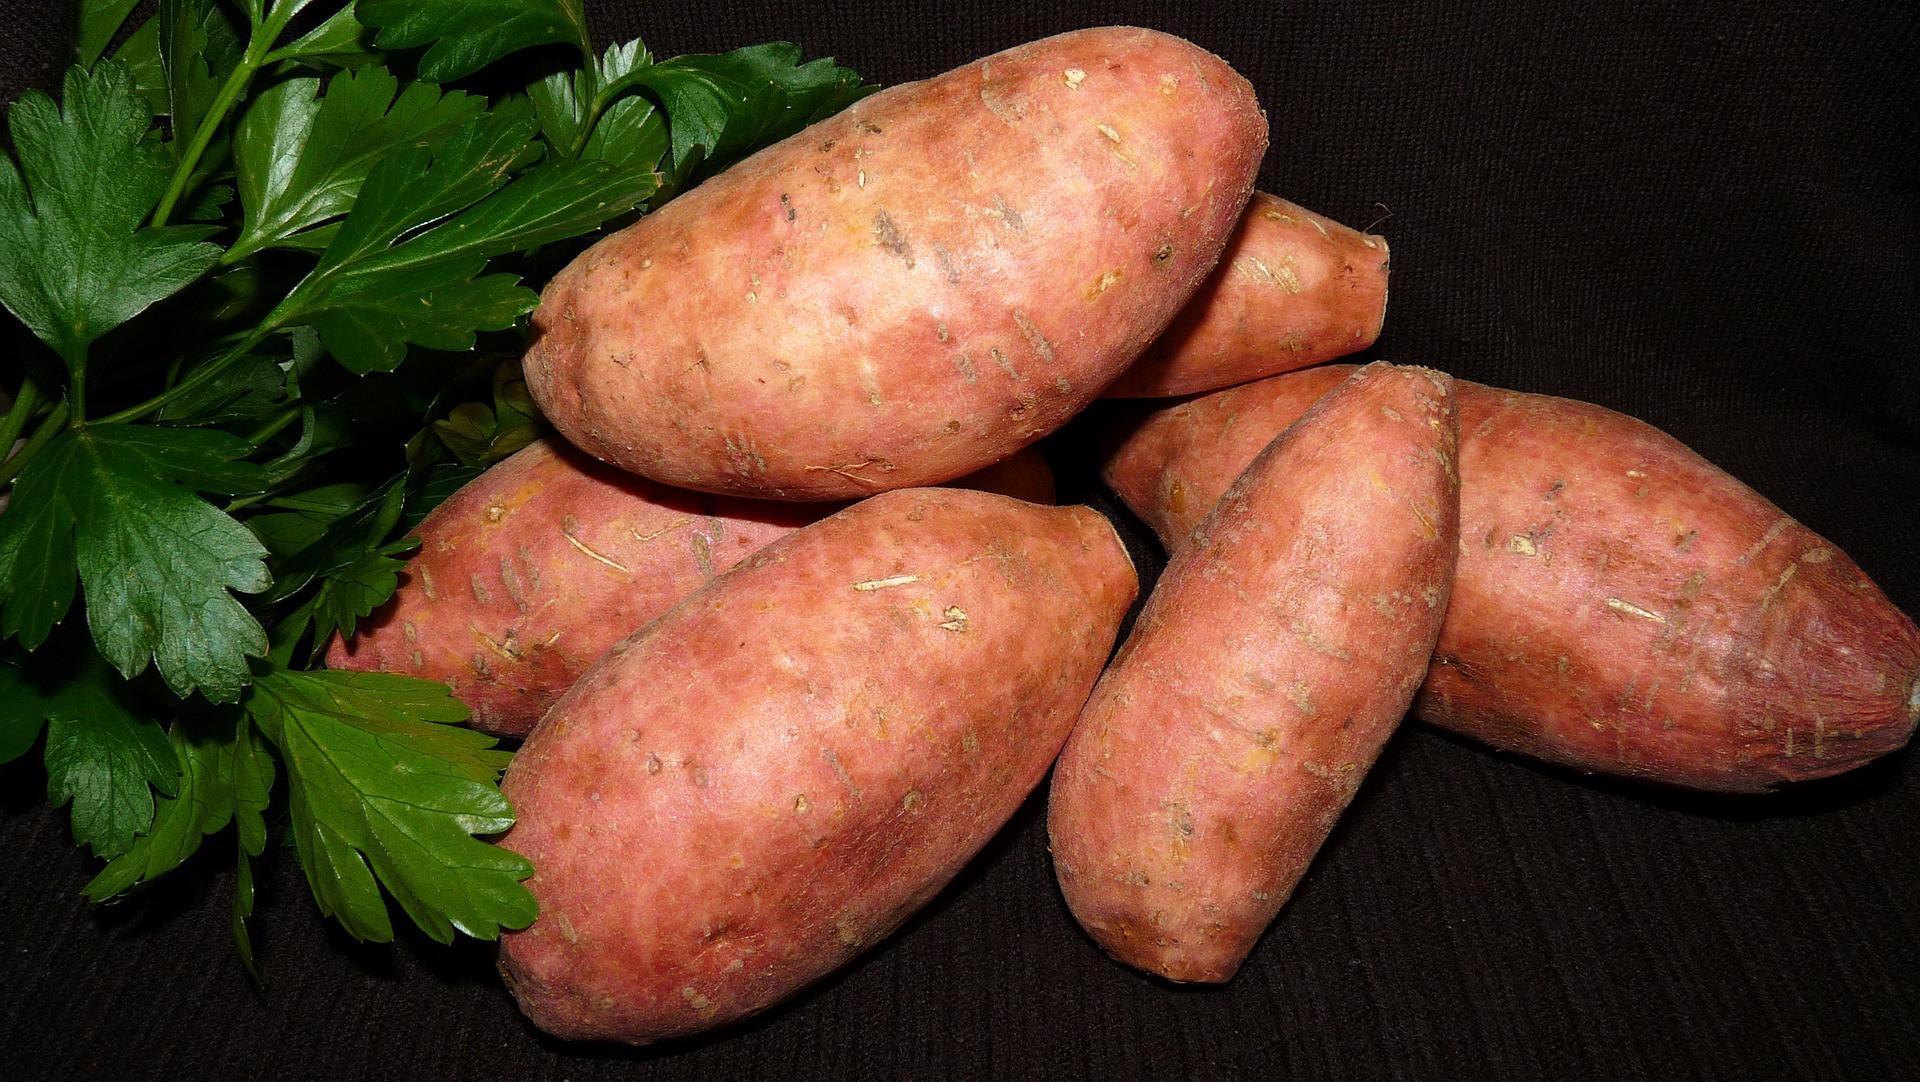 Shingled Sweet Potatoes